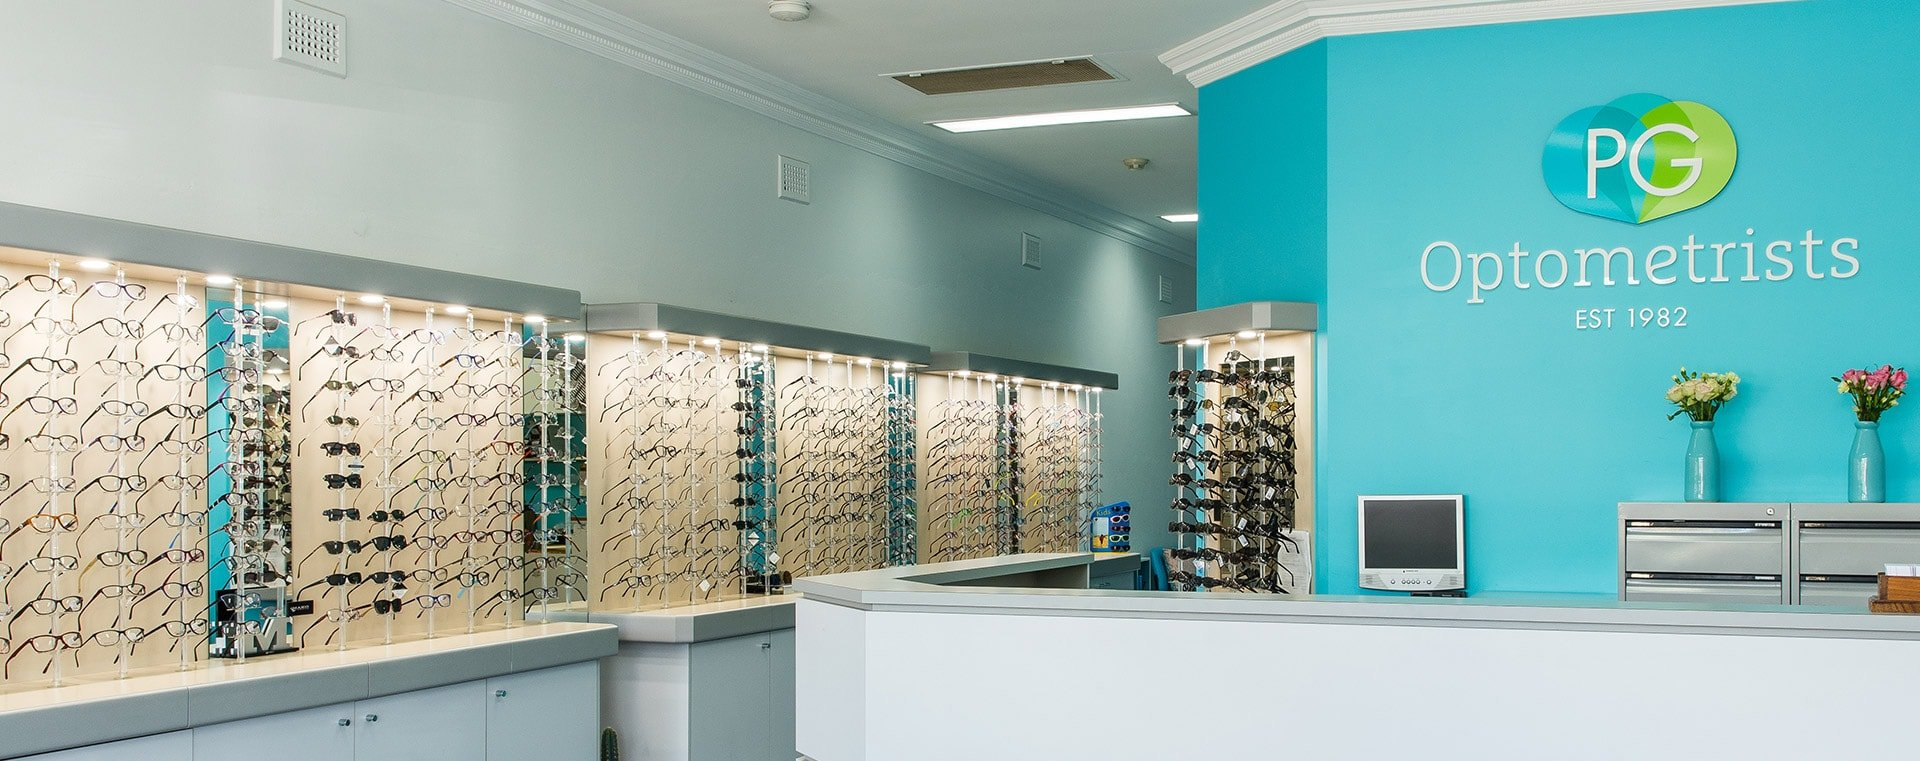 Pizzardi & Gardener Optometrists